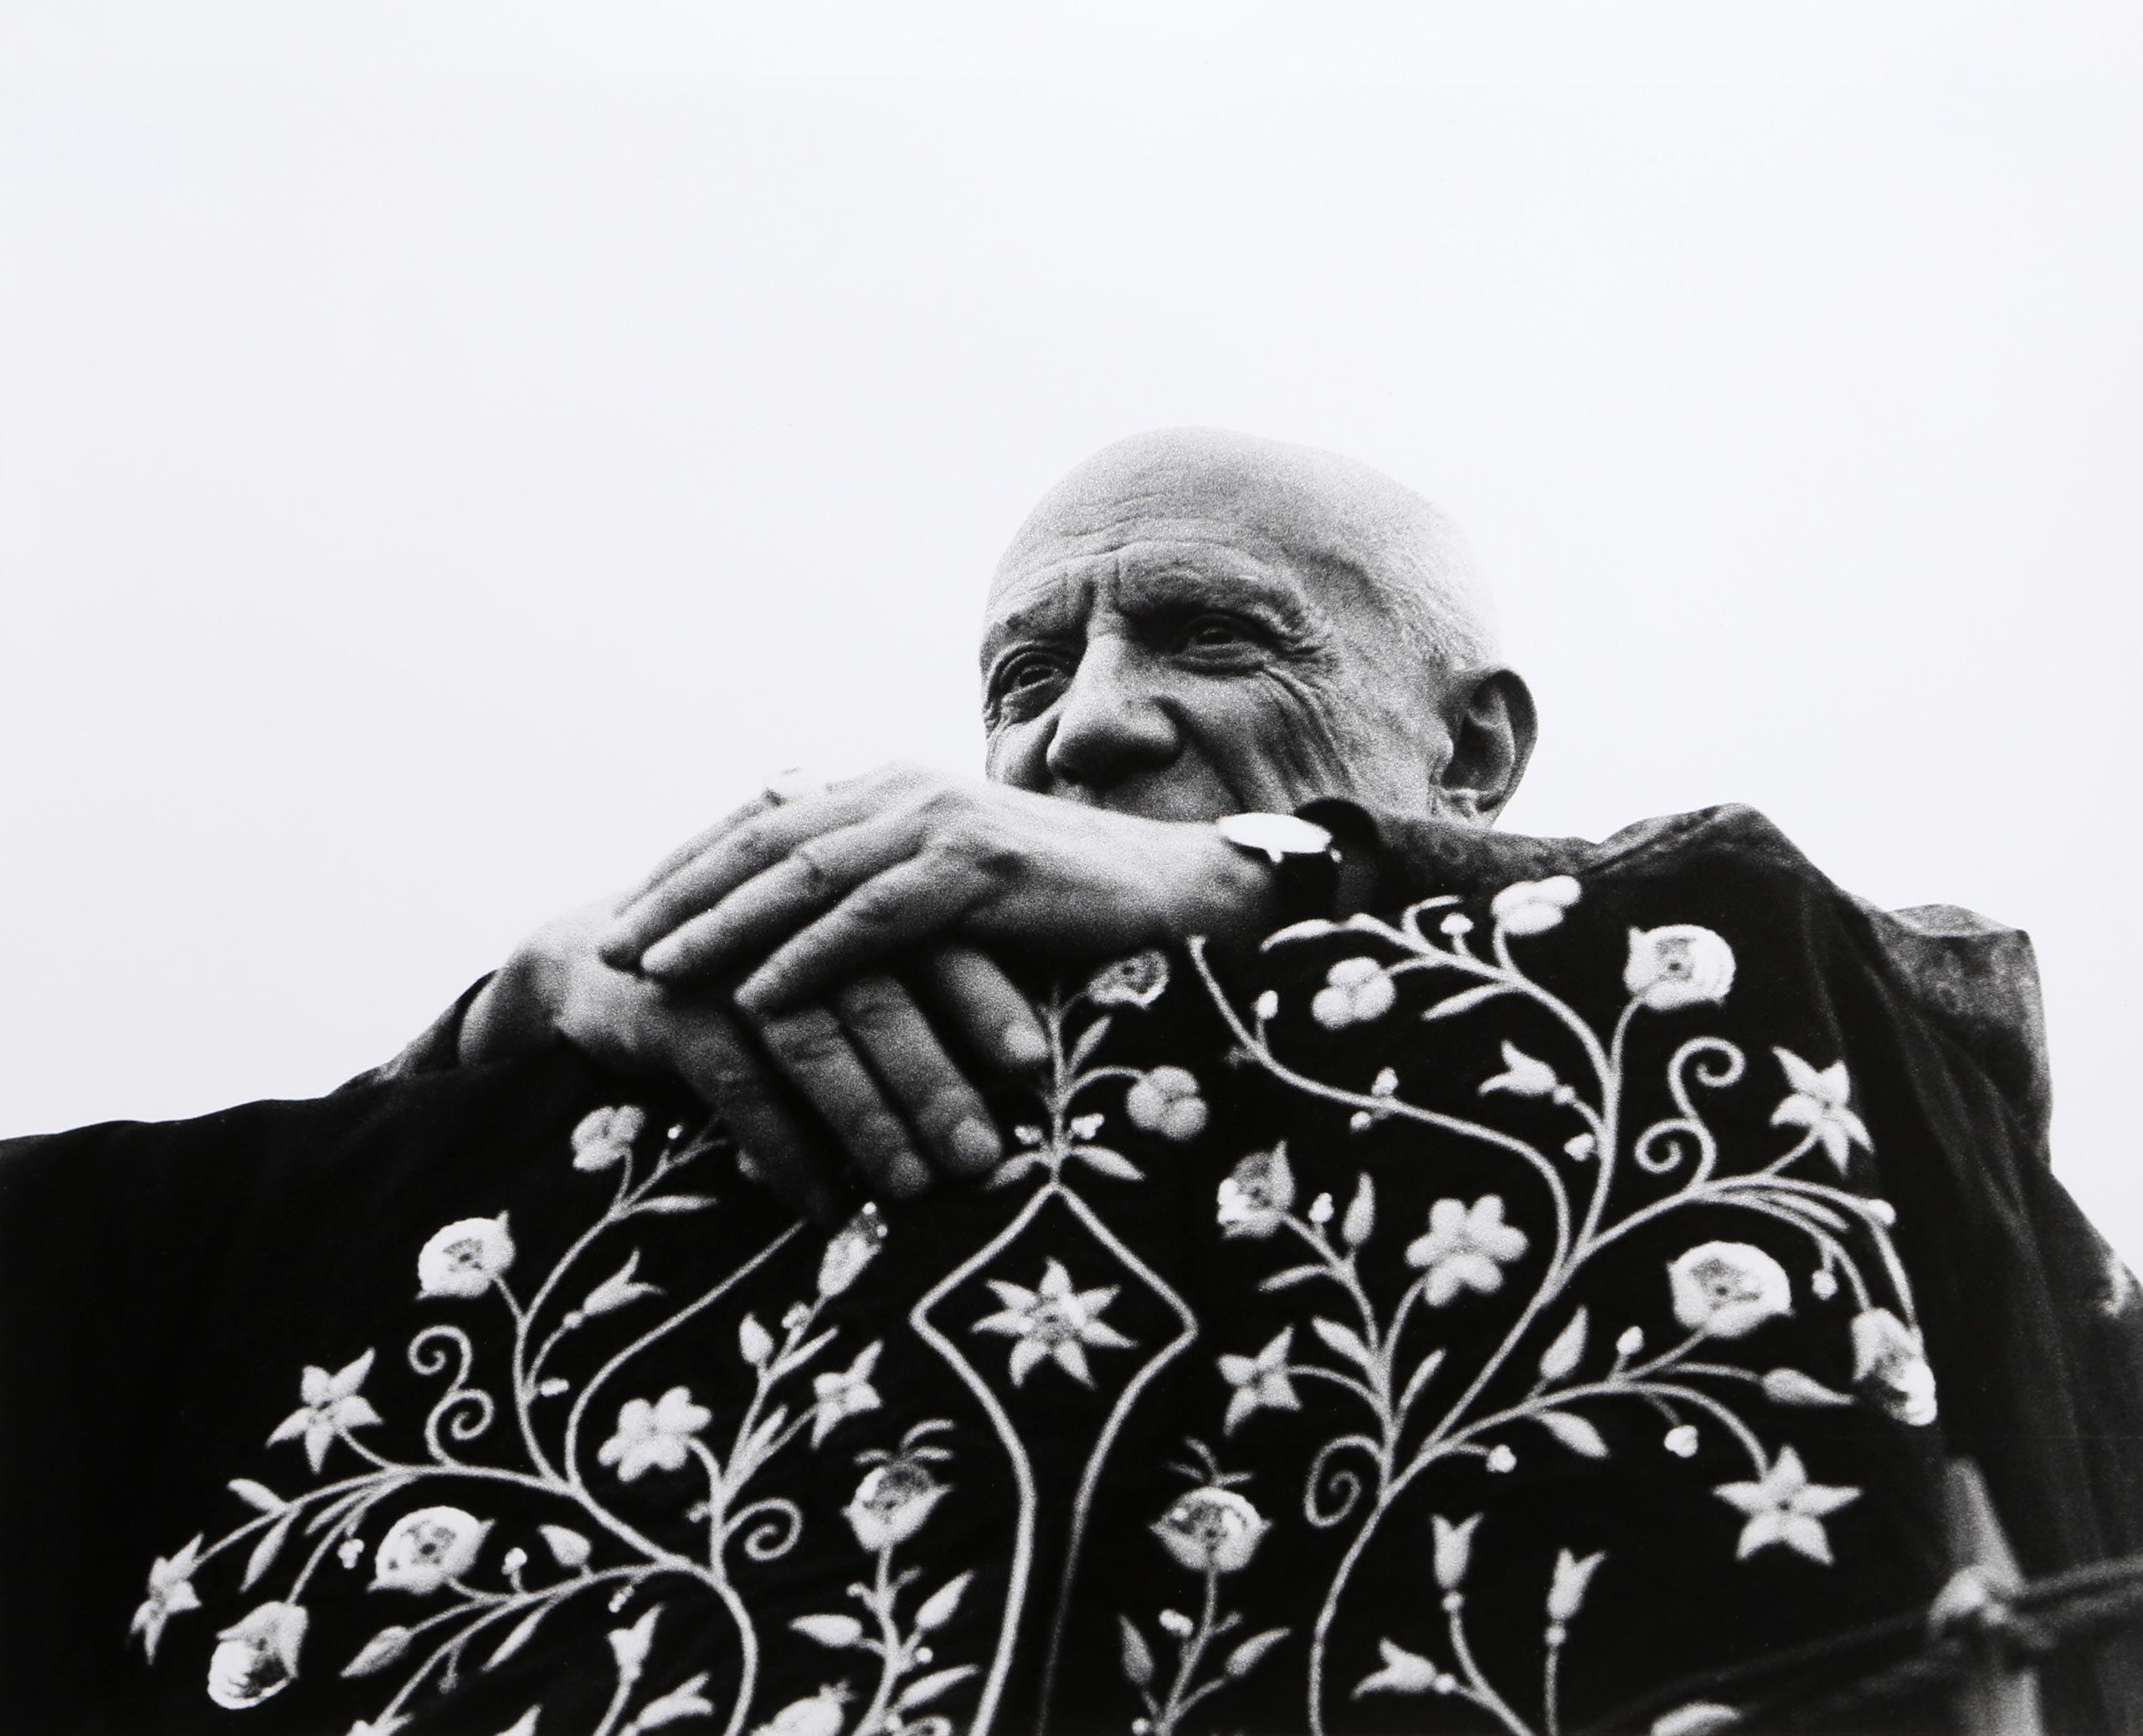 Picasso Preside la Corrida - Frejus, 1962.